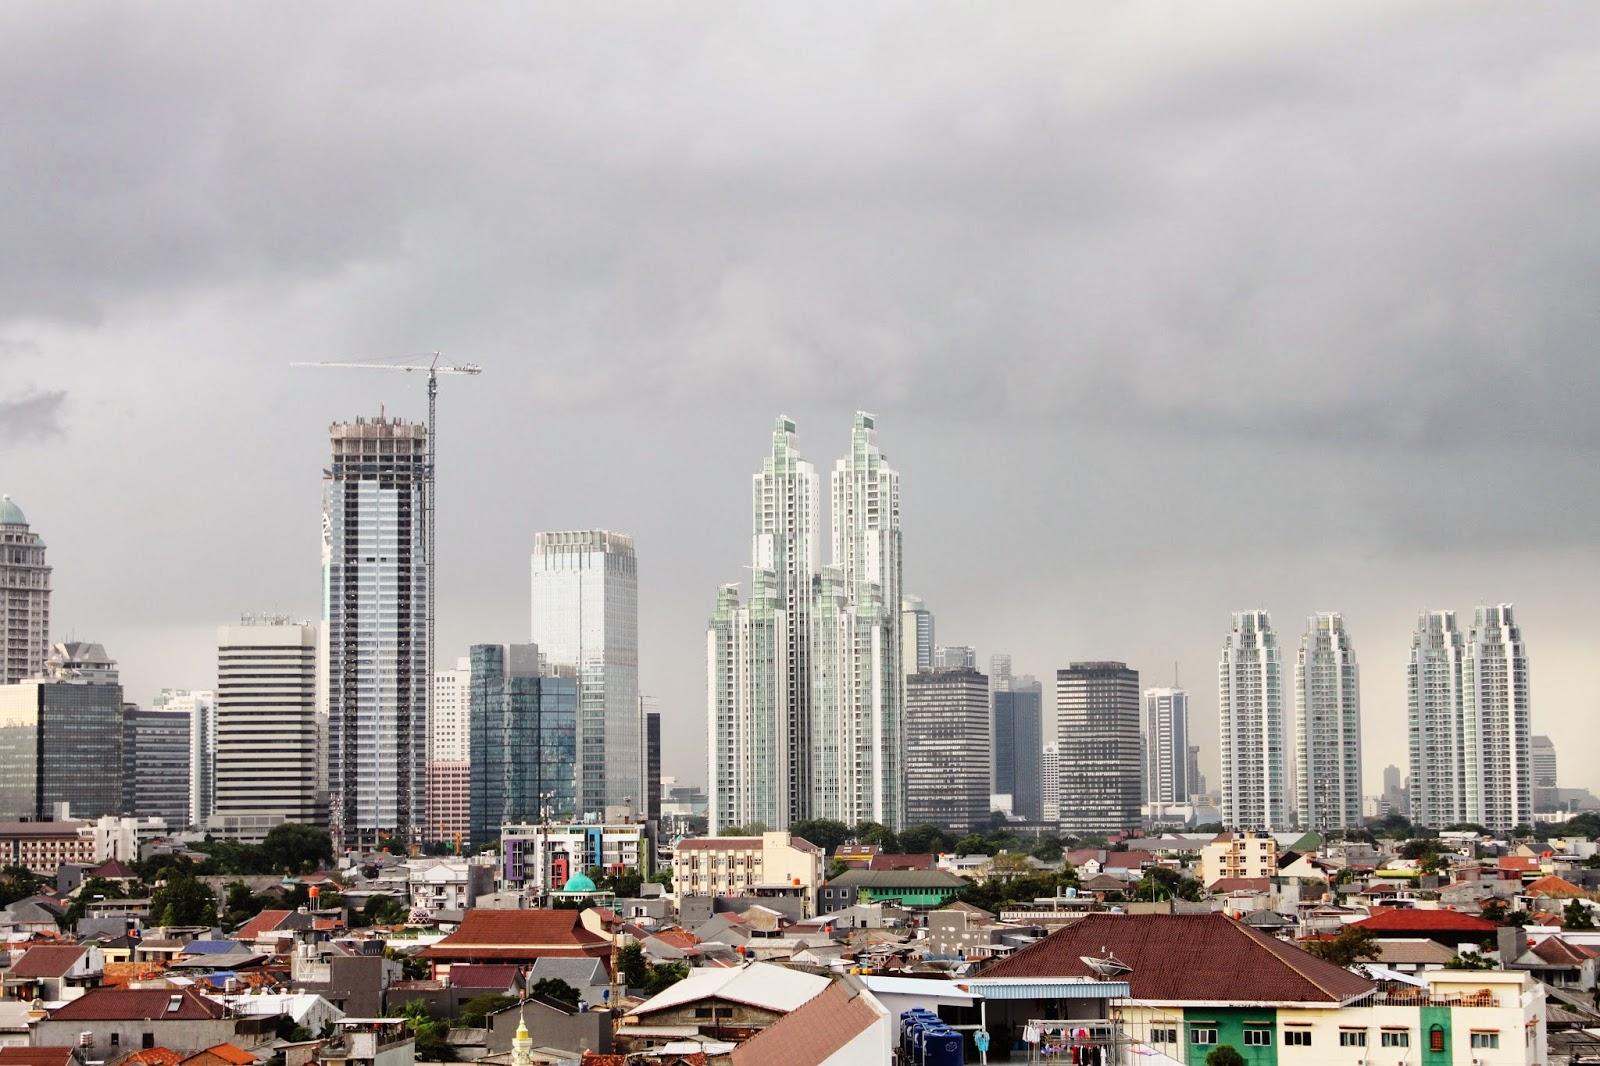 Central economic region: characteristics, cities, problems 70